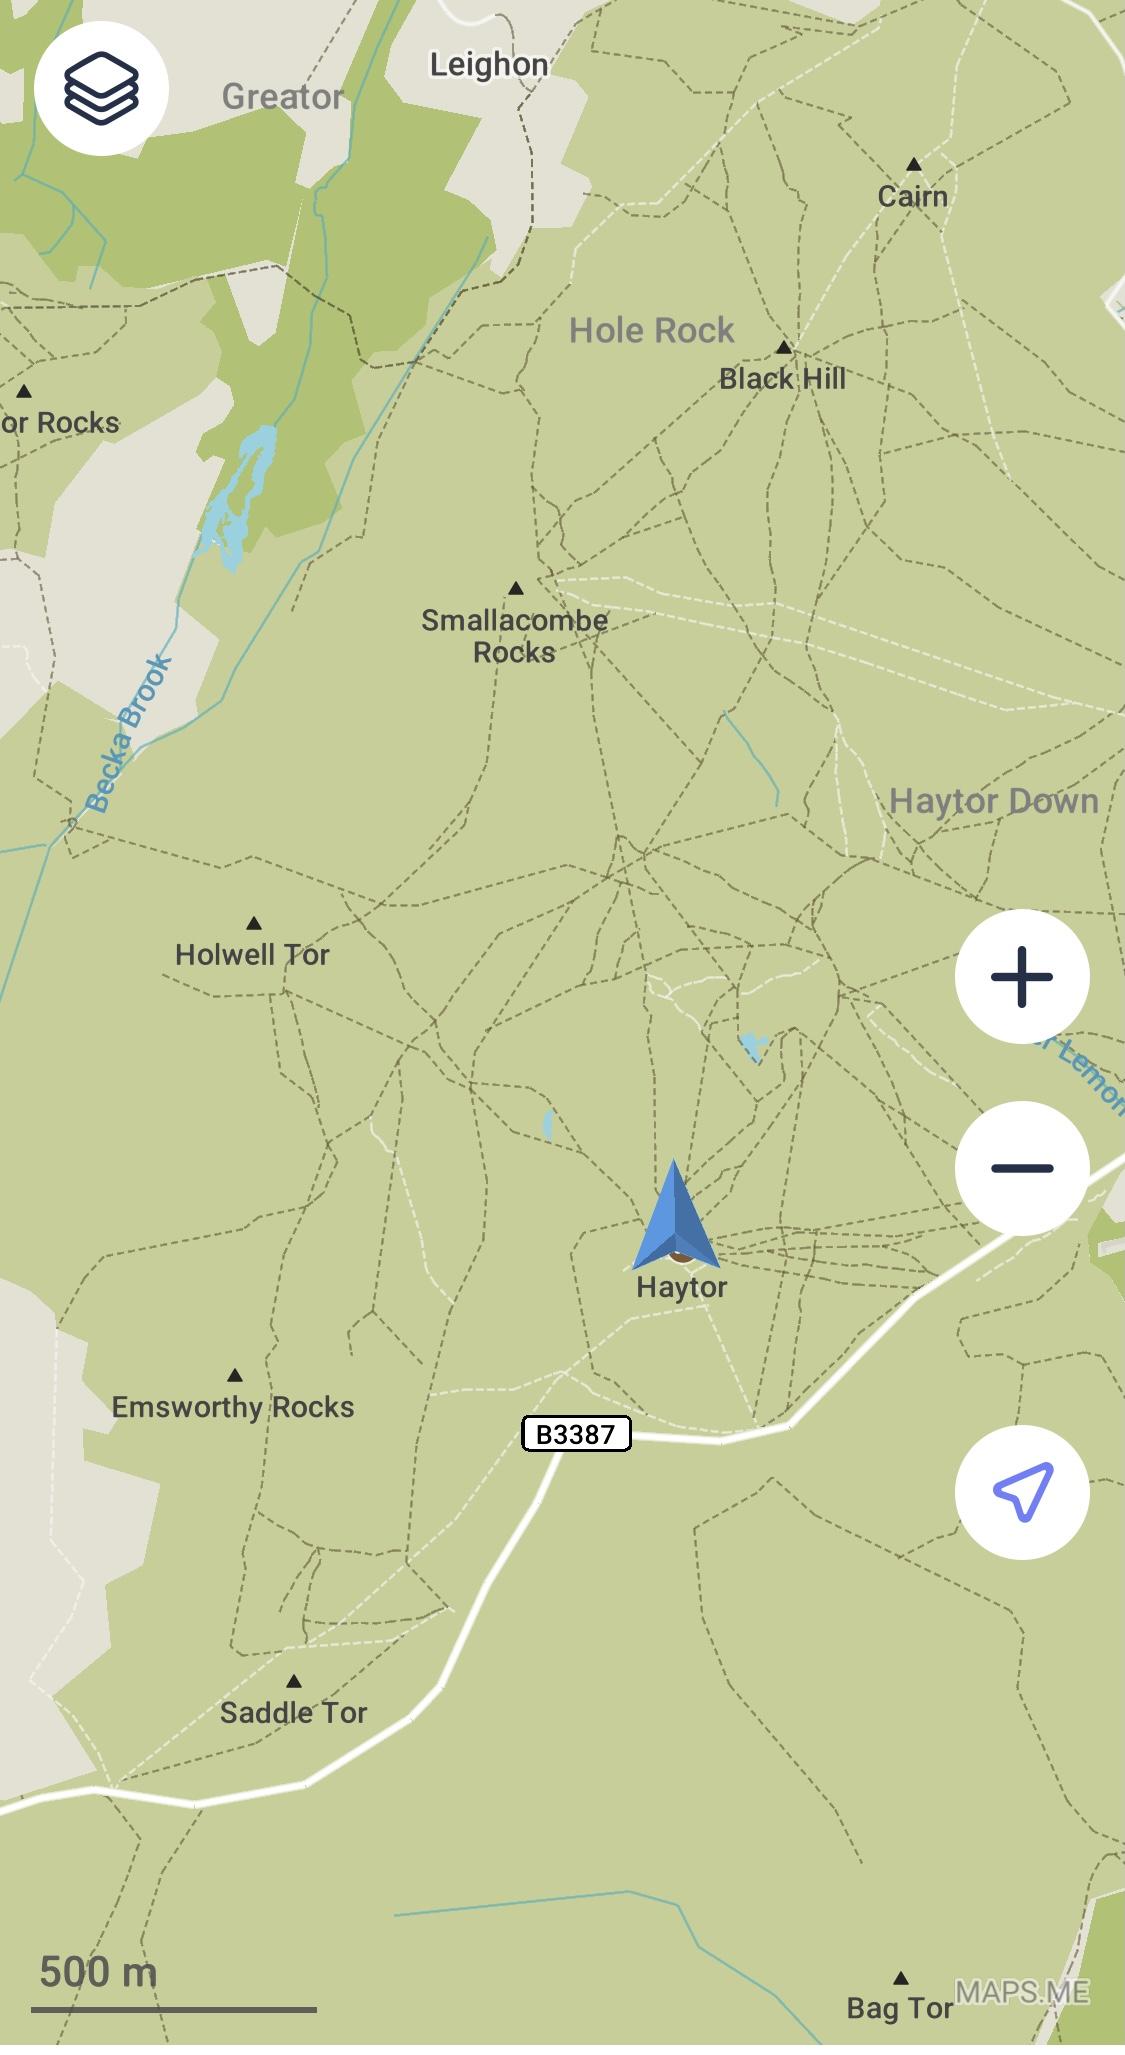 Dartmoor Footpaths